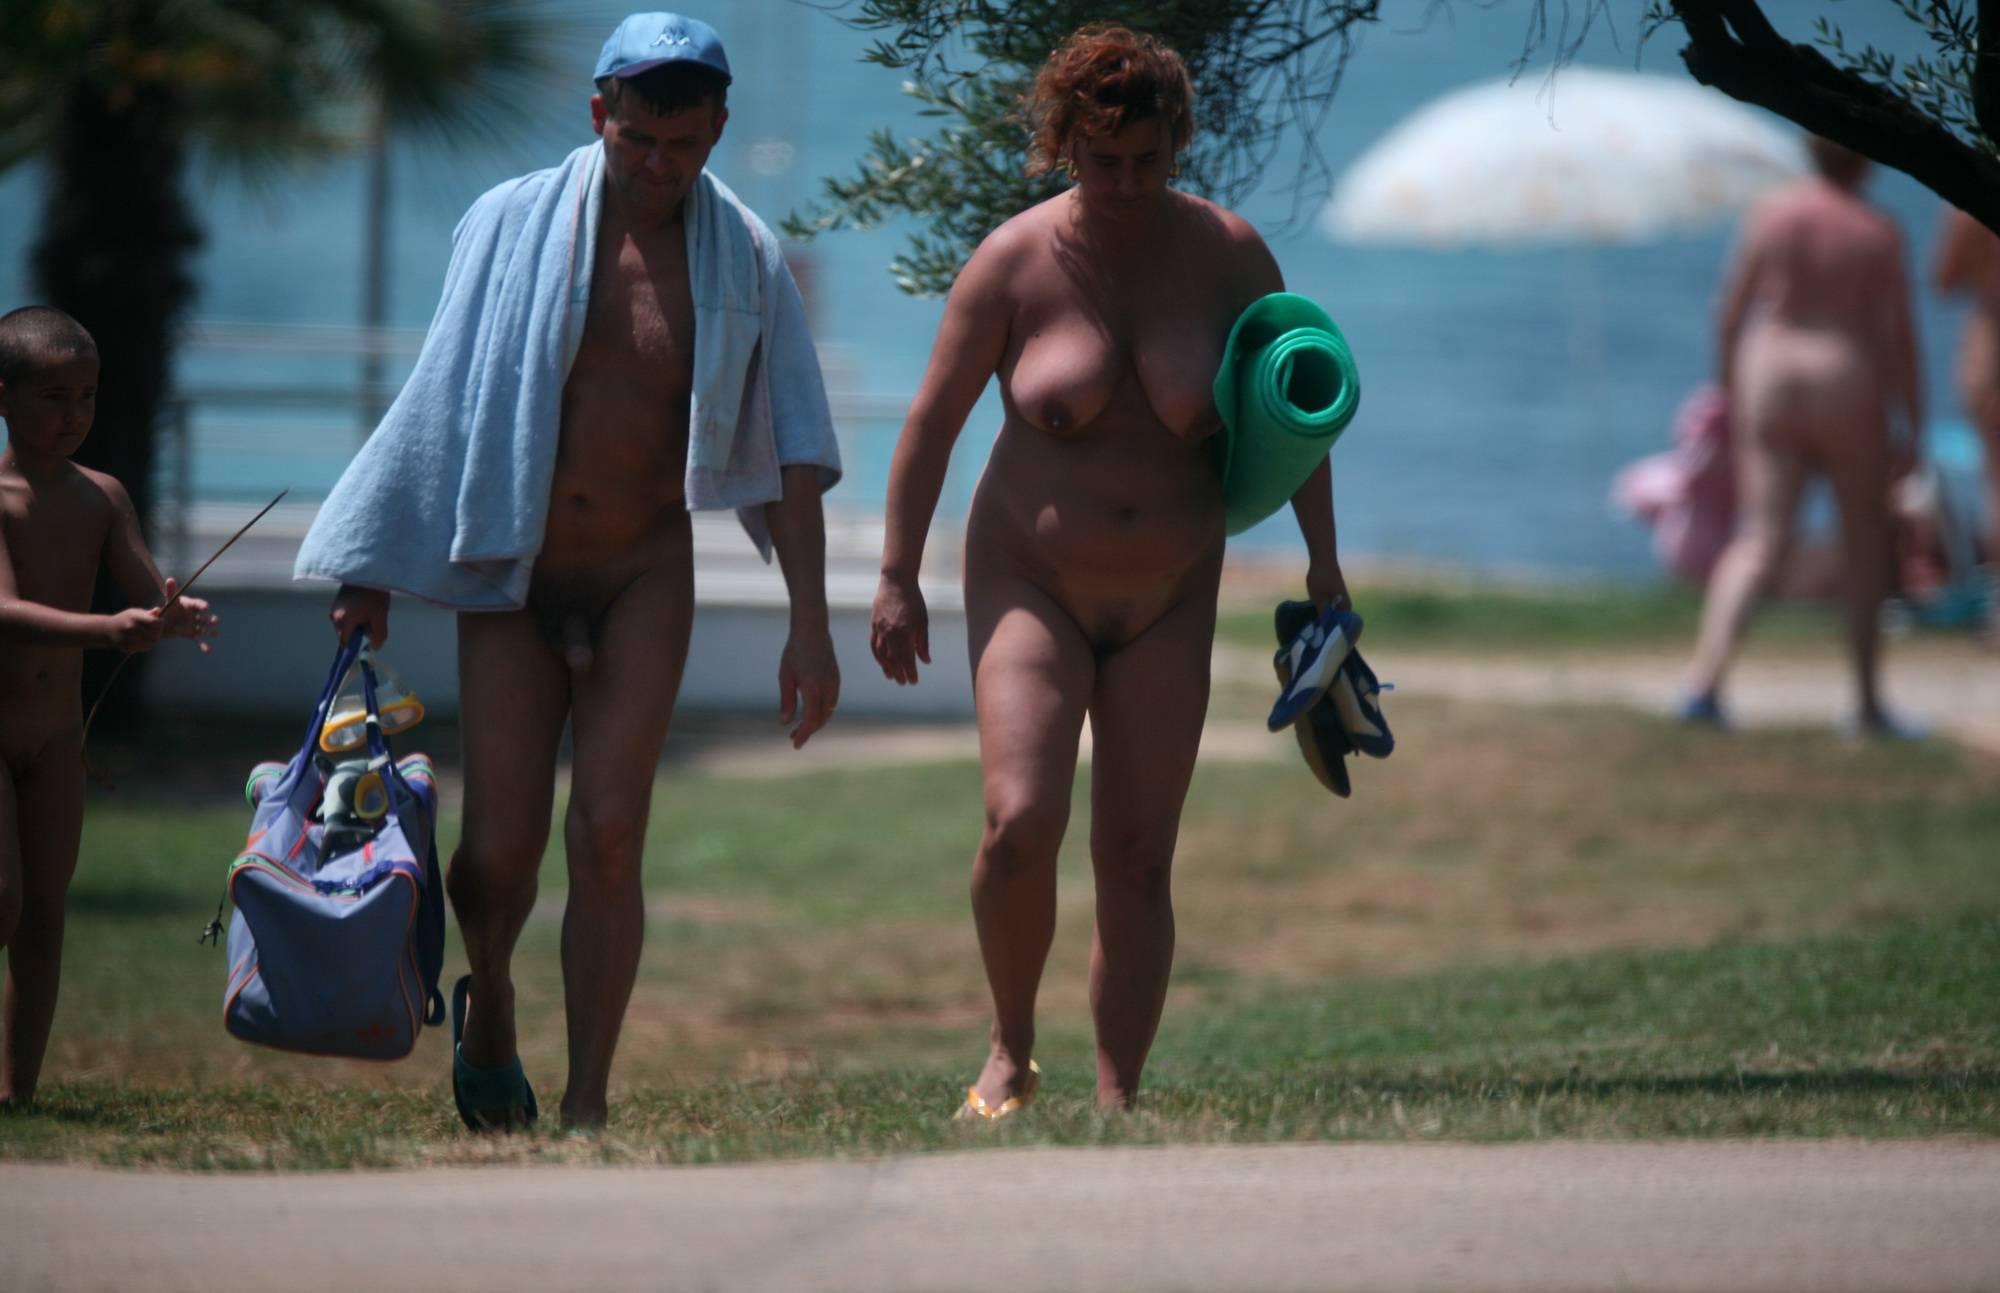 Purenudism Images-Nude Park Walks Captured - 2